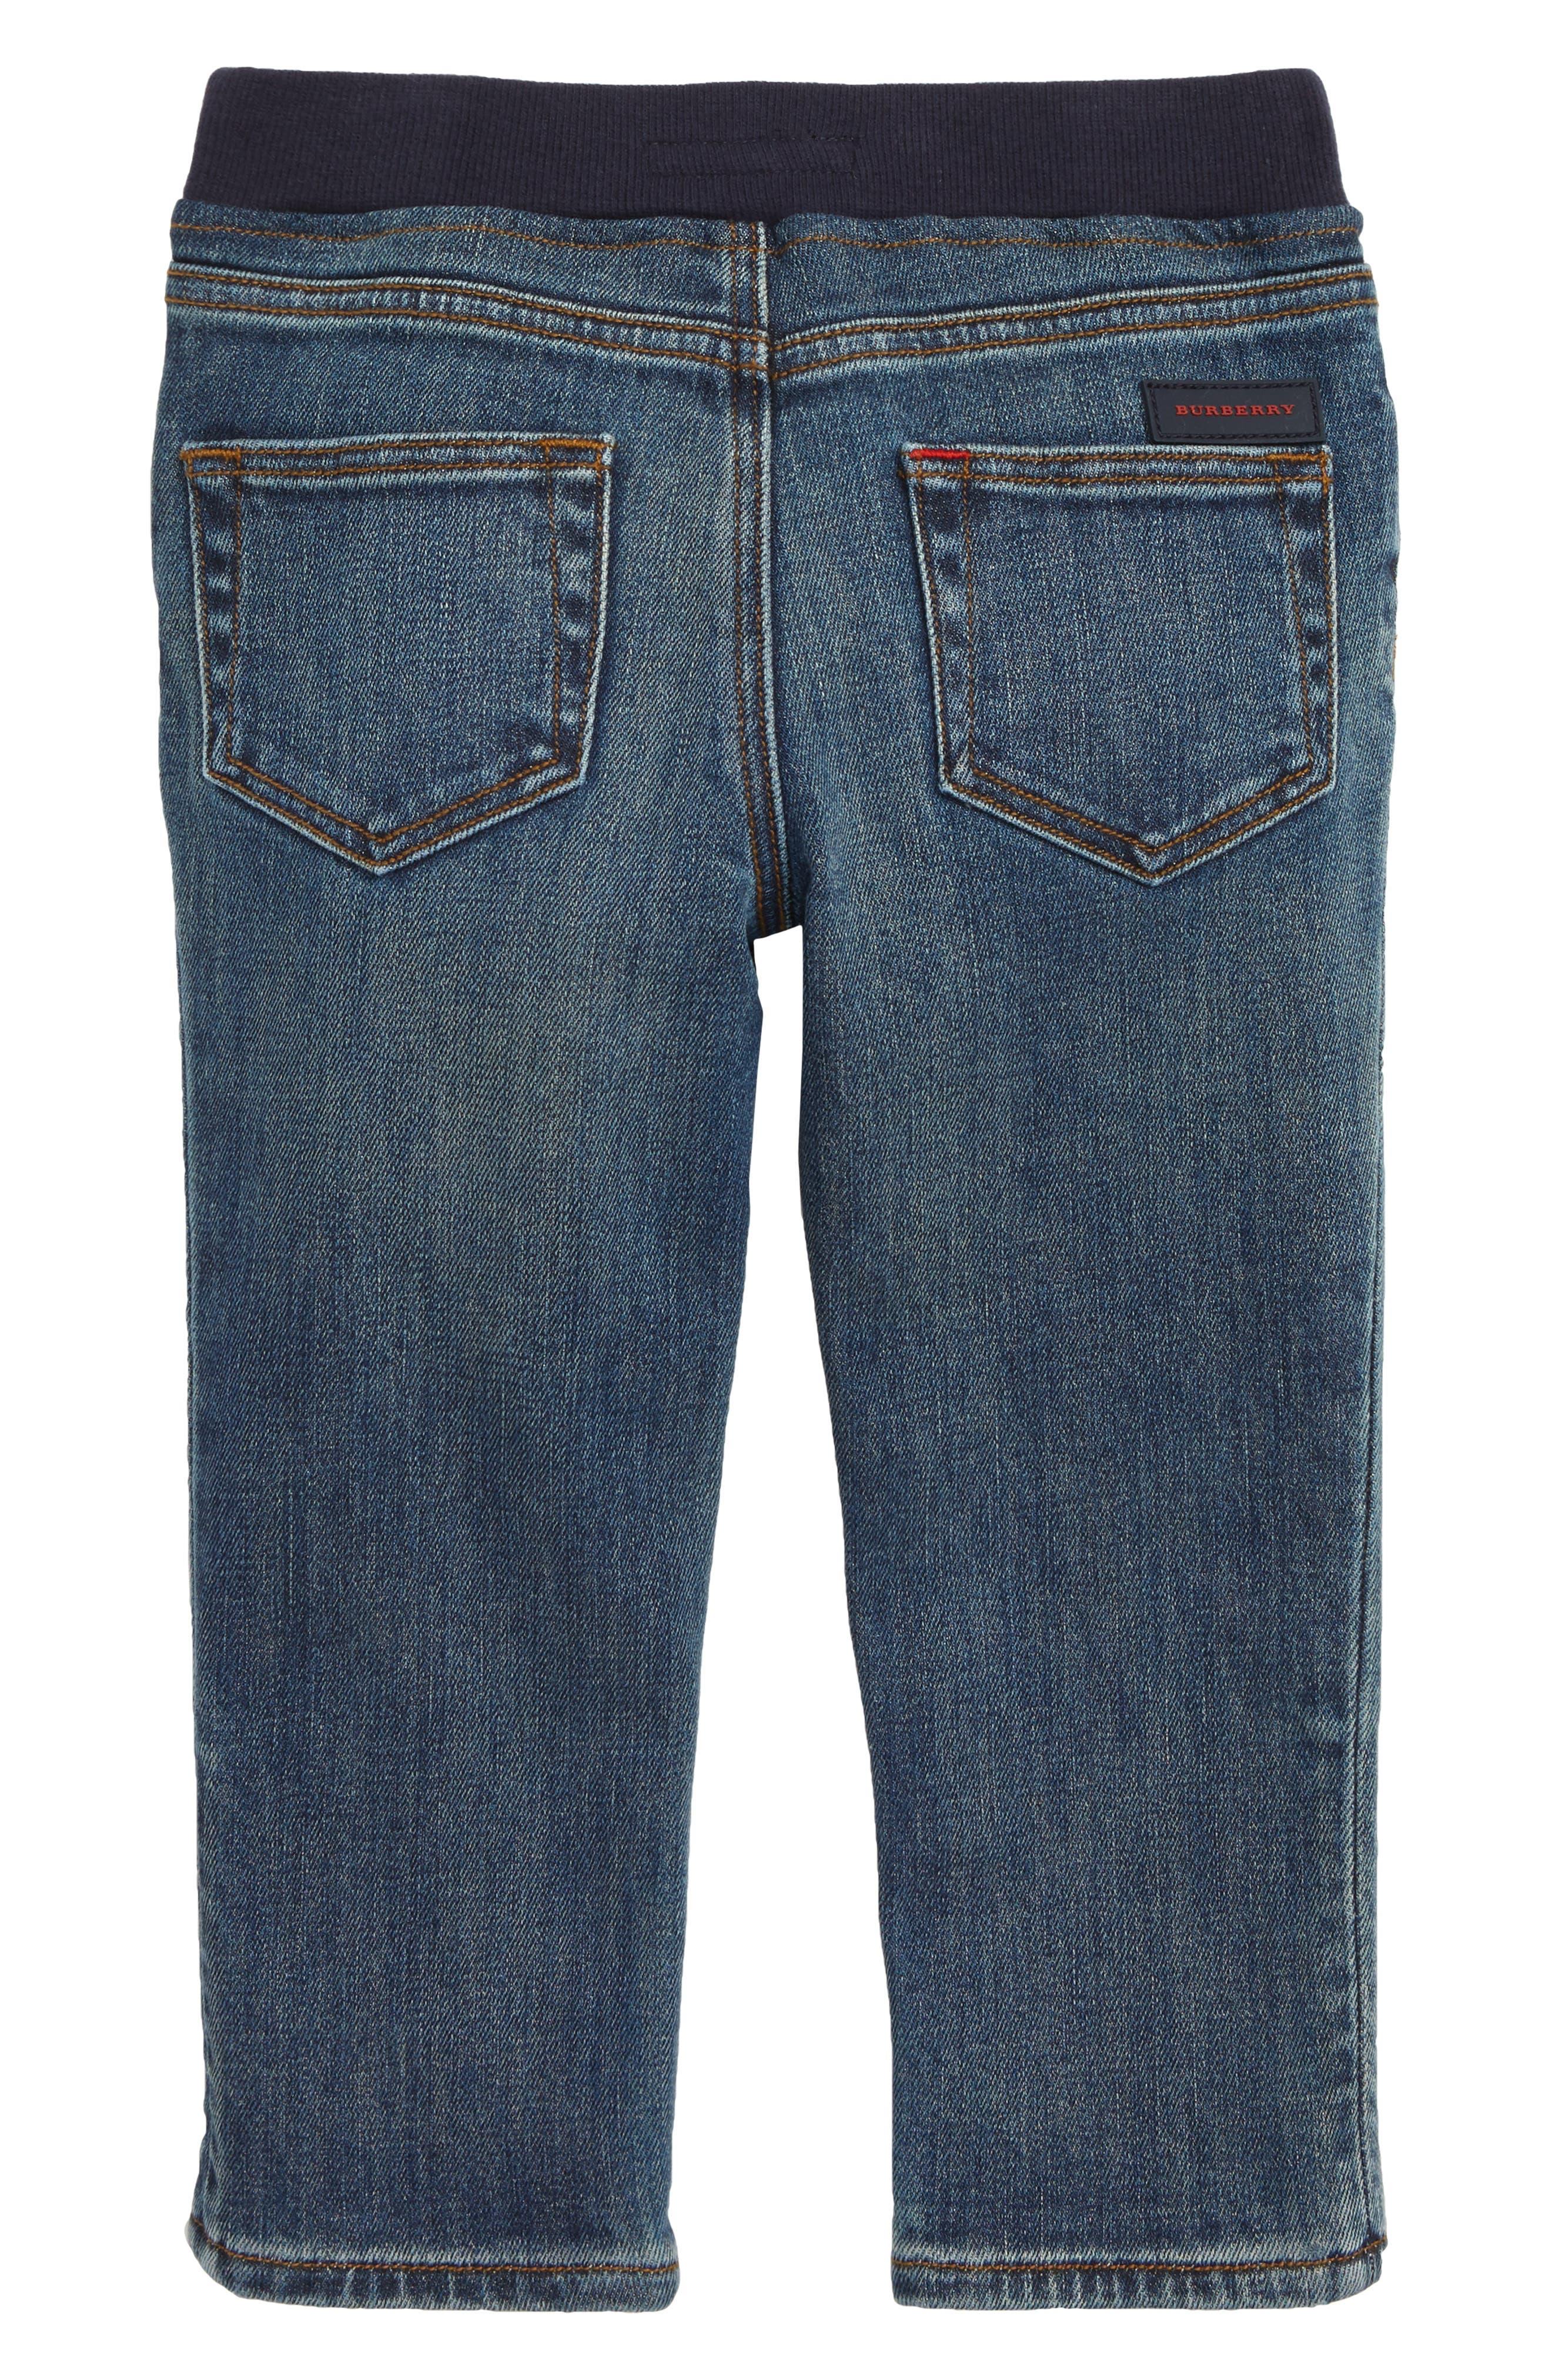 Pull-On Jeans,                             Alternate thumbnail 2, color,                             MID INDIGO